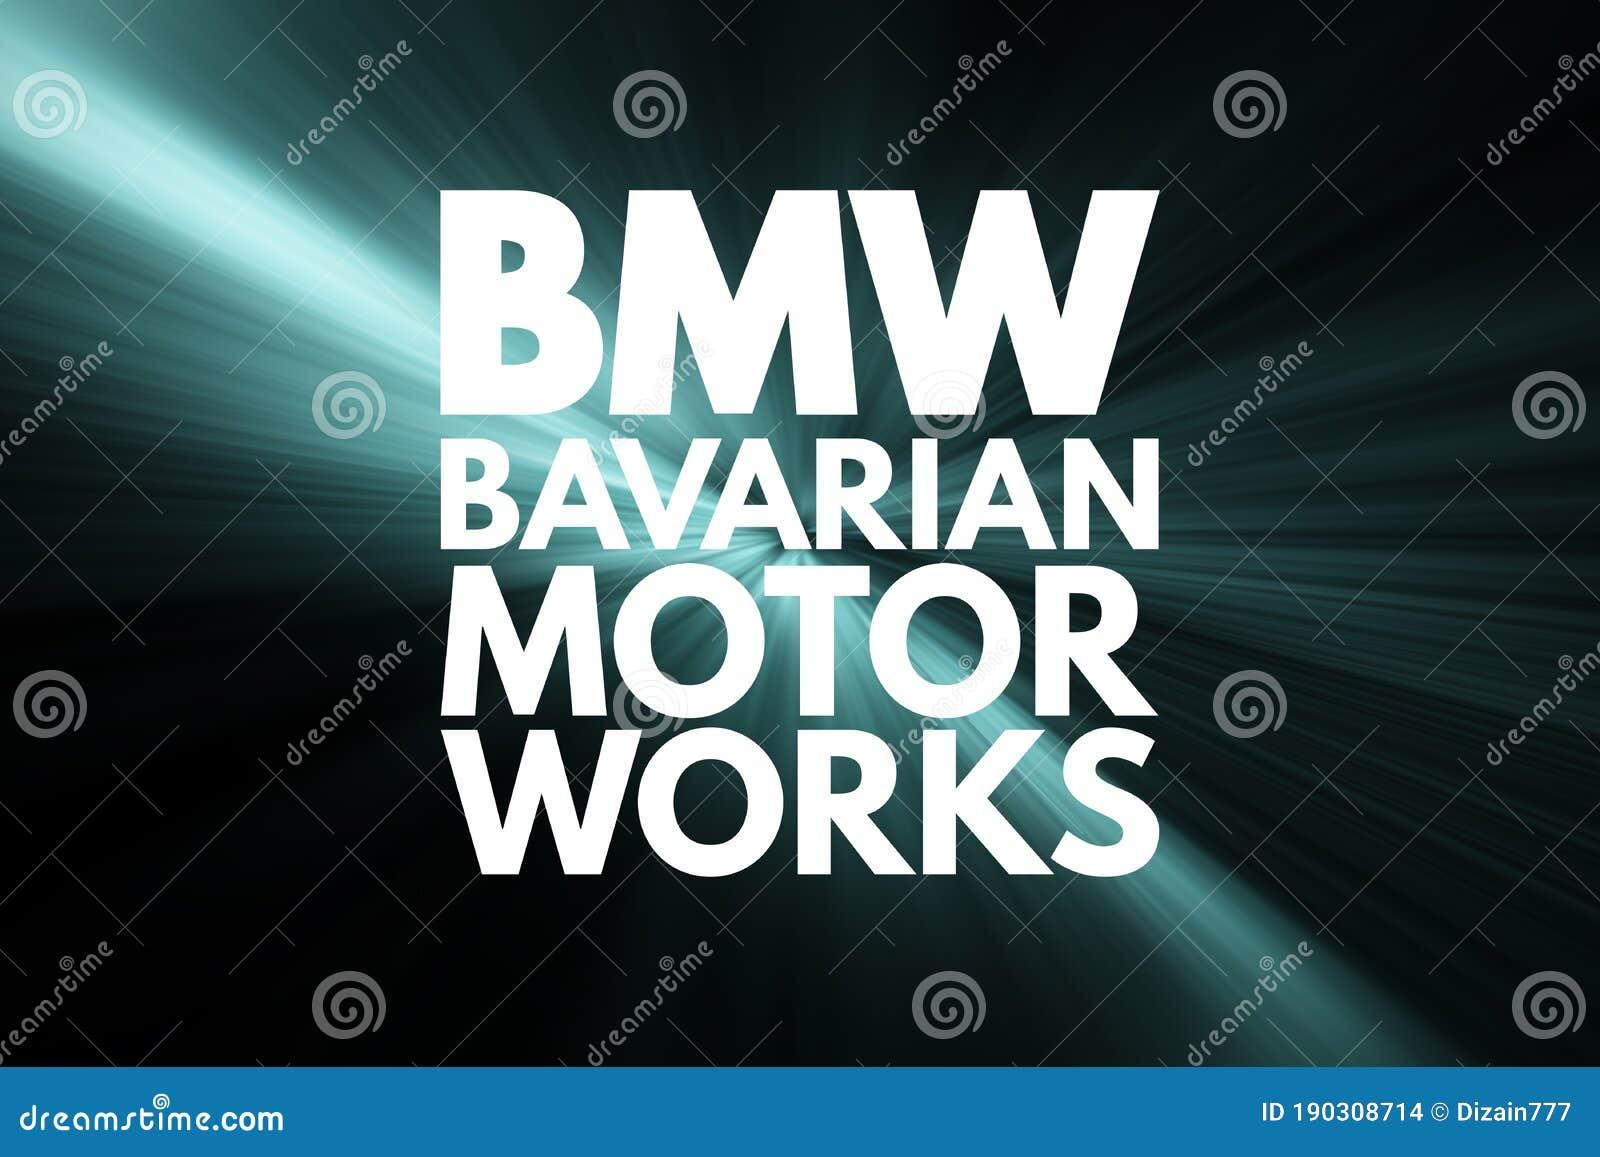 Bmw Bavarian Motor Works Acronym Concept Background Stock Illustration Illustration Of Abbreviation Deutschland 190308714